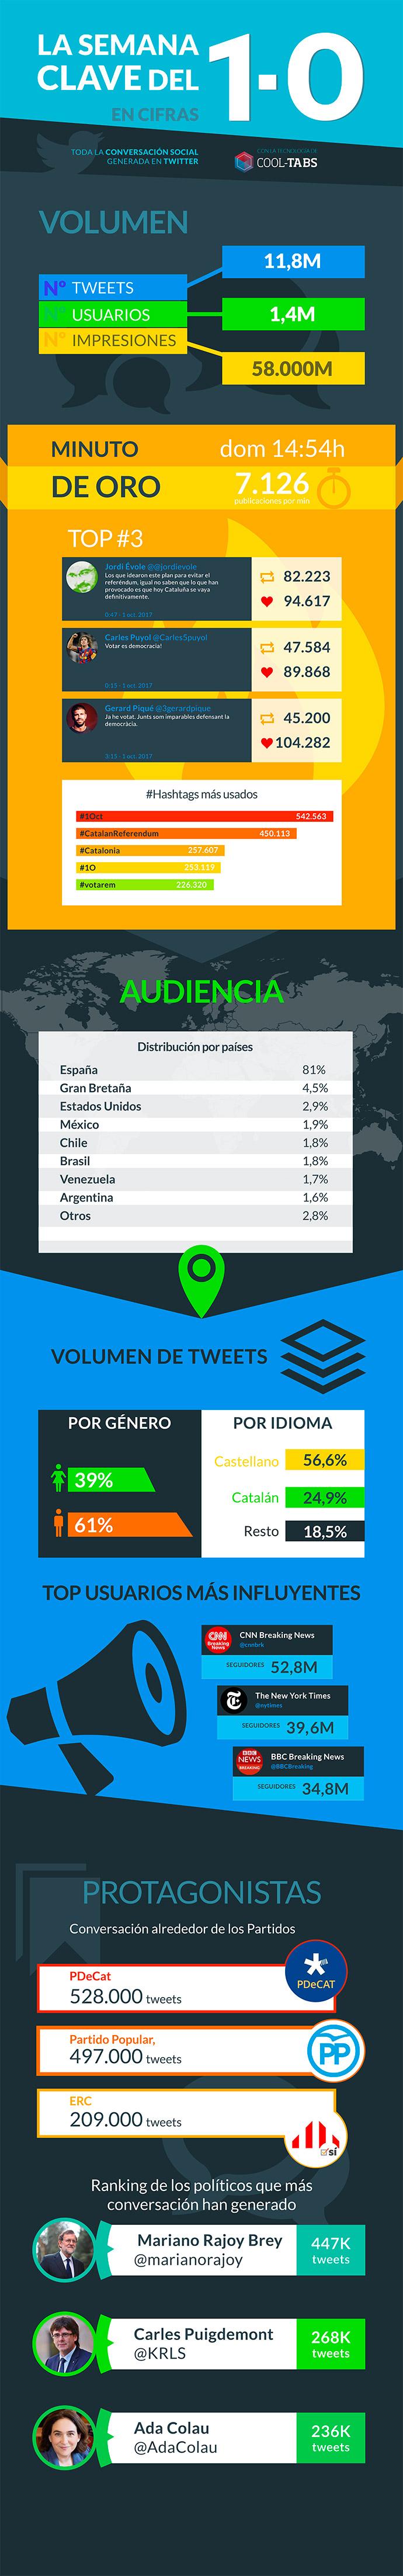 infografia-referendum-ilegal-cataluña